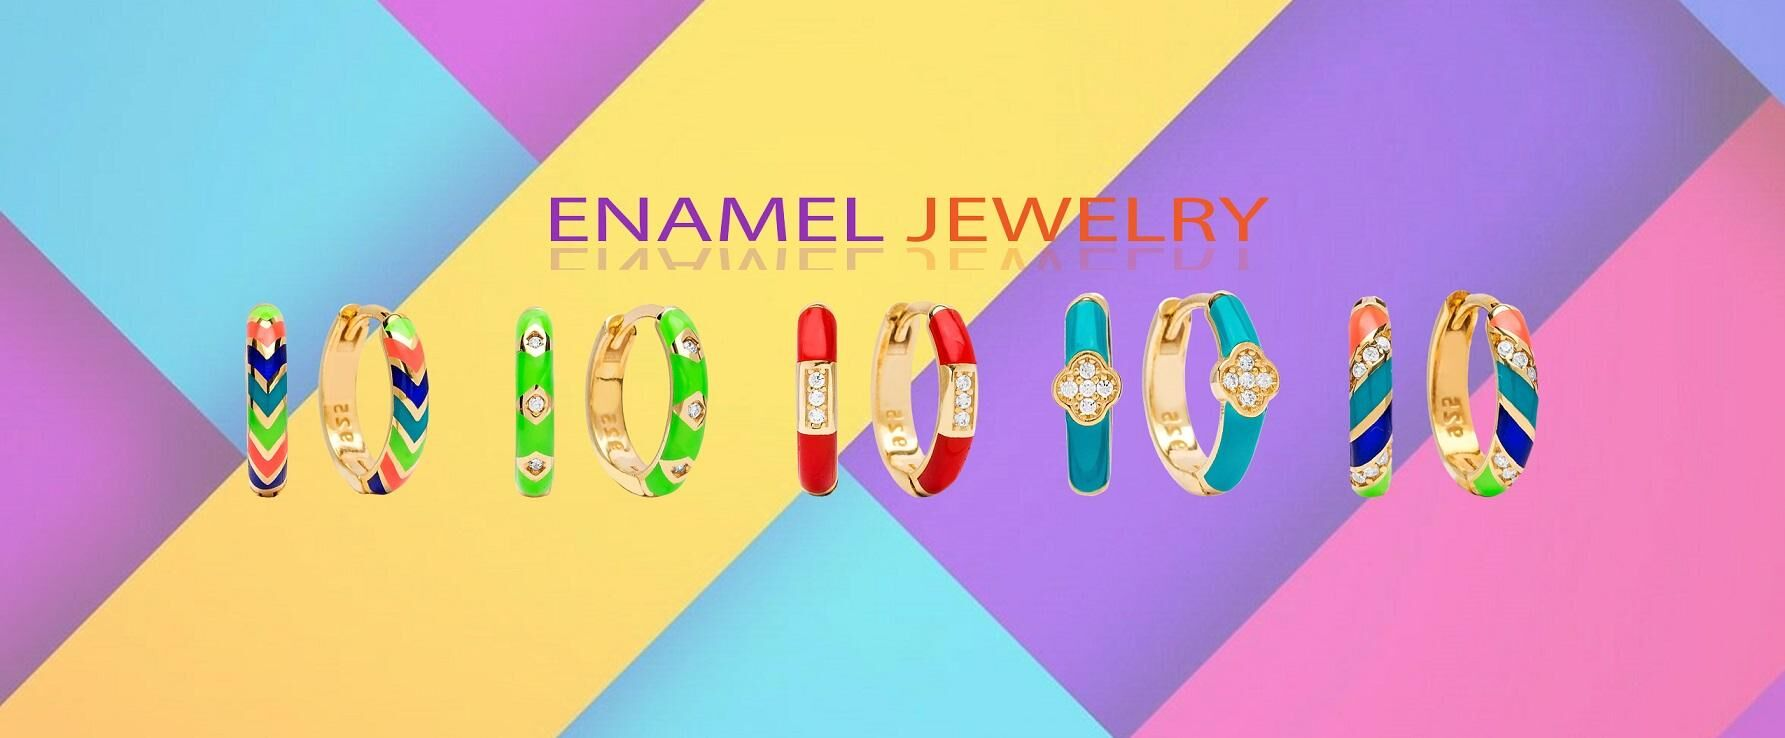 ENAMEL JEWERLY